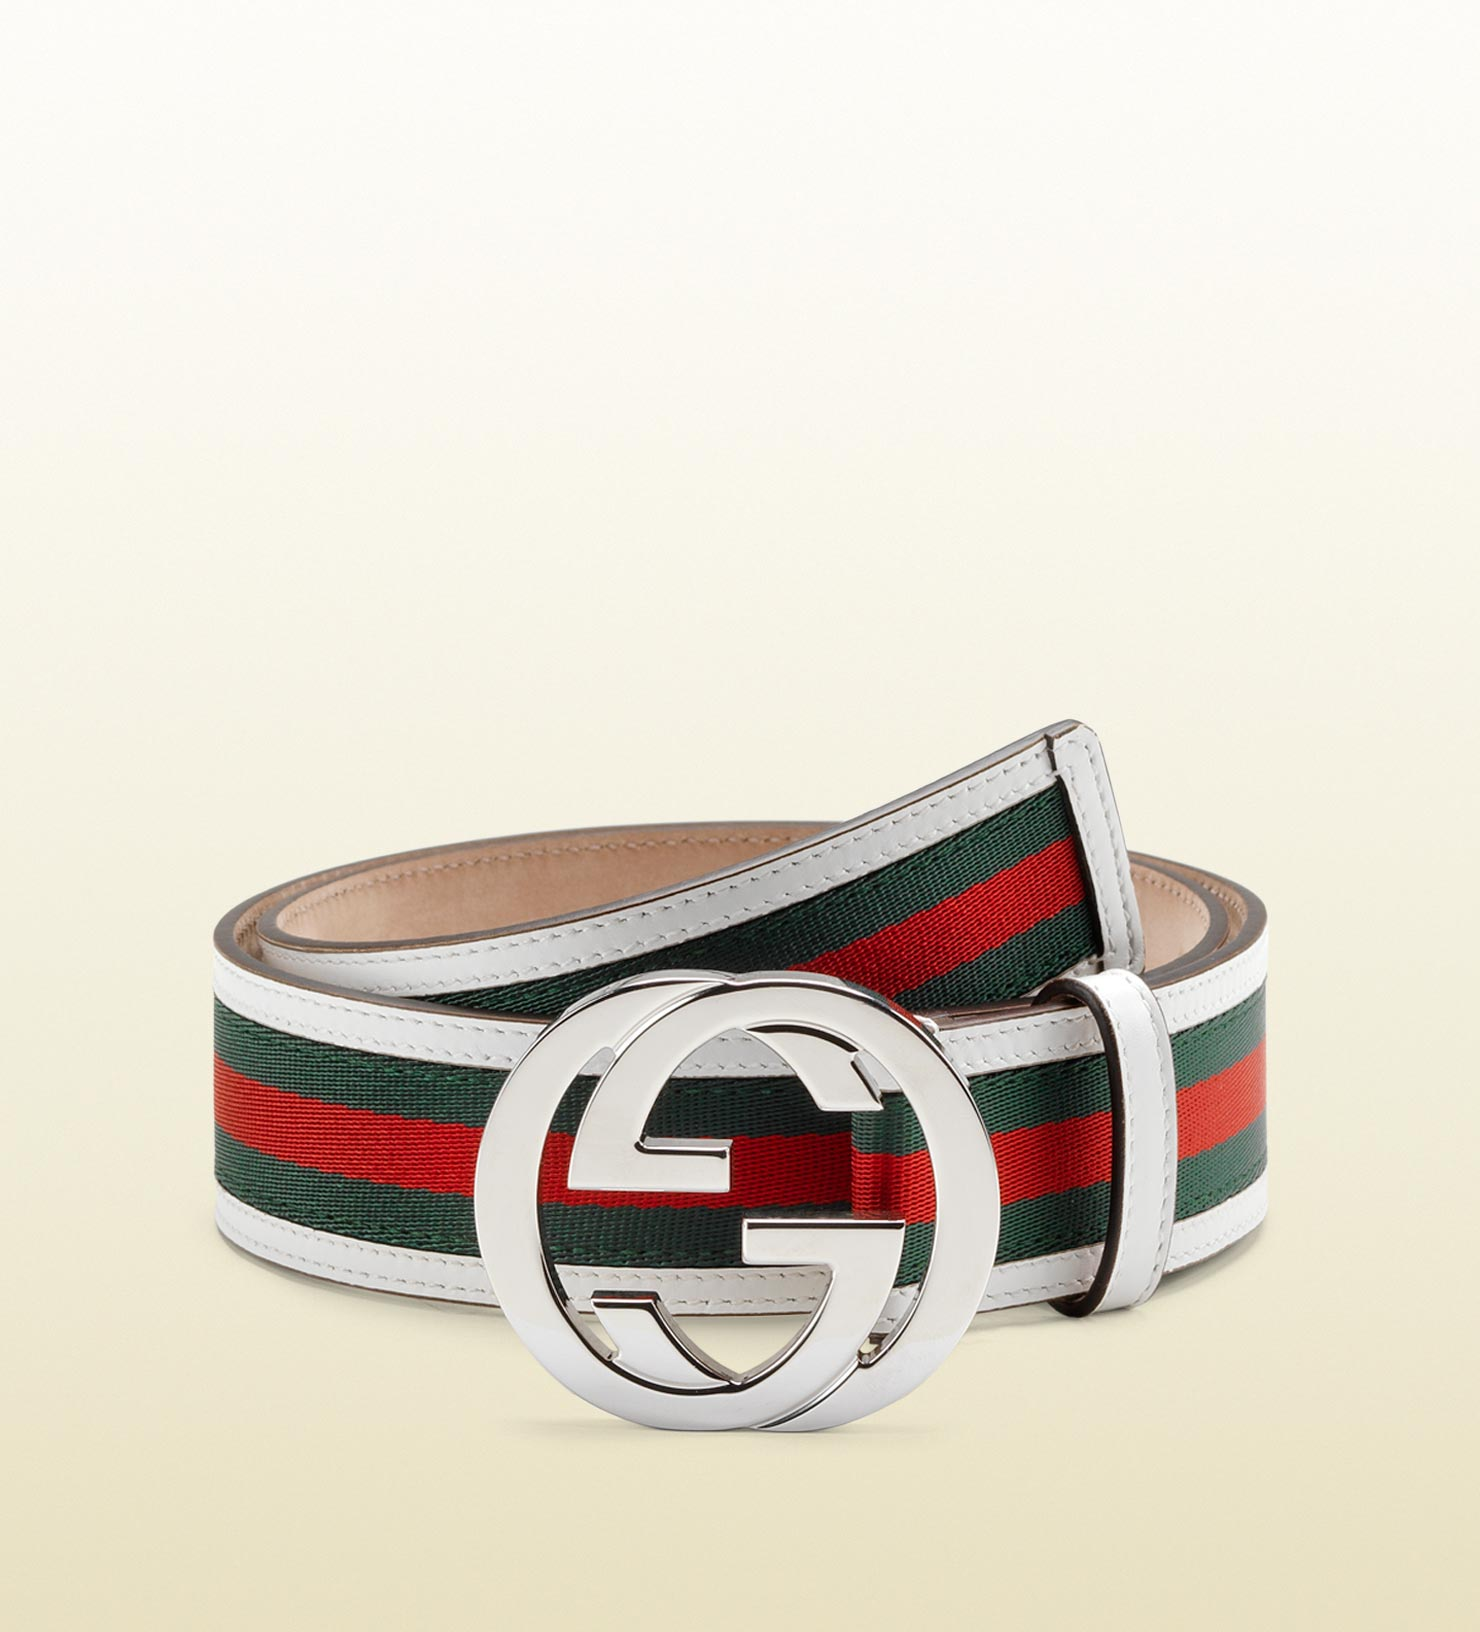 0fb381fb87c Gucci - Metallic Signature Web Belt With Interlocking G Buckle for Men -  Lyst